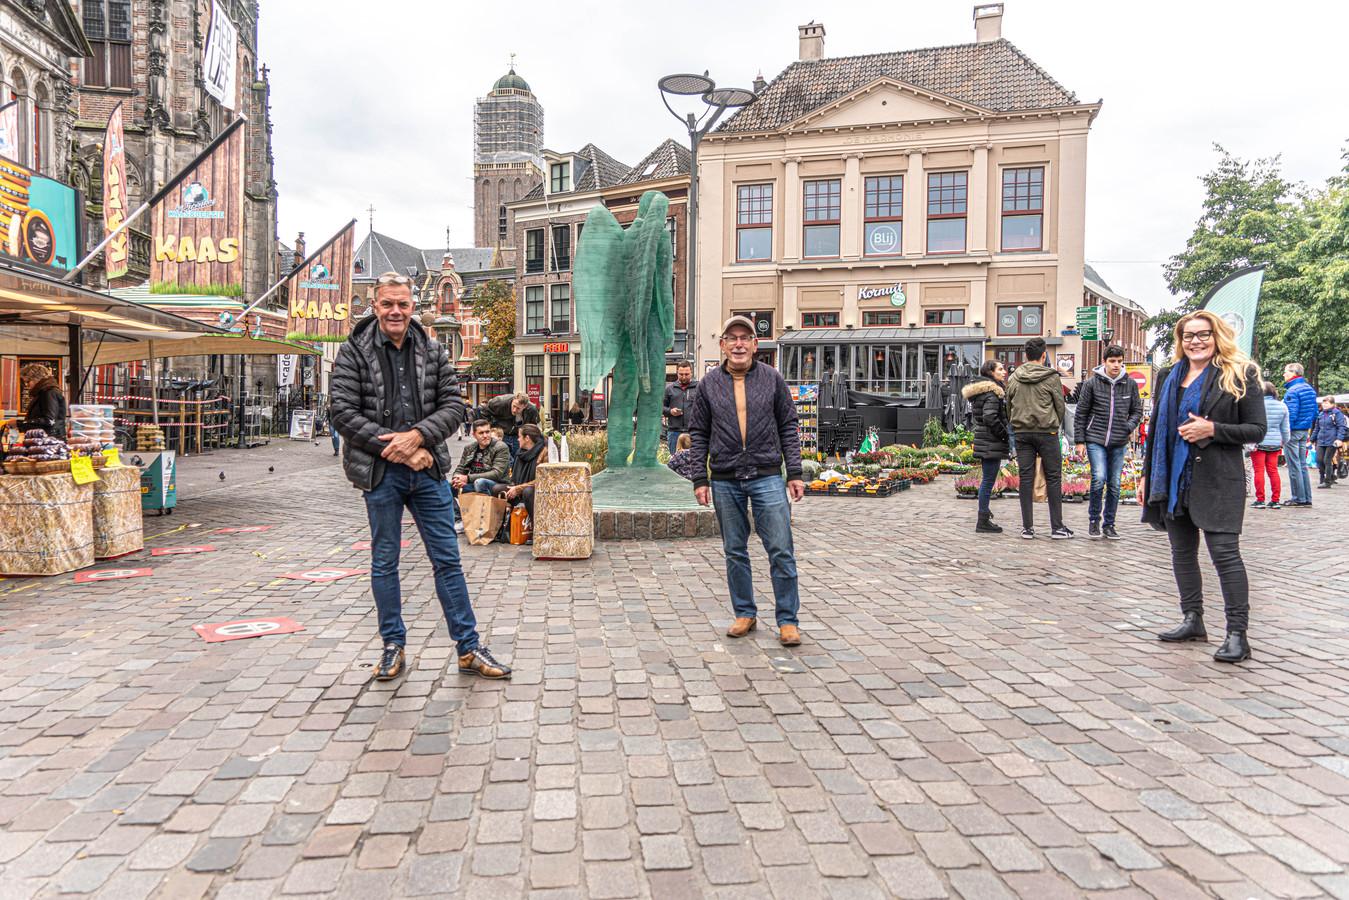 Ype Bosma, Theo Runhaar en Aukje Grouwstra op de Grote Markt in Zwolle.